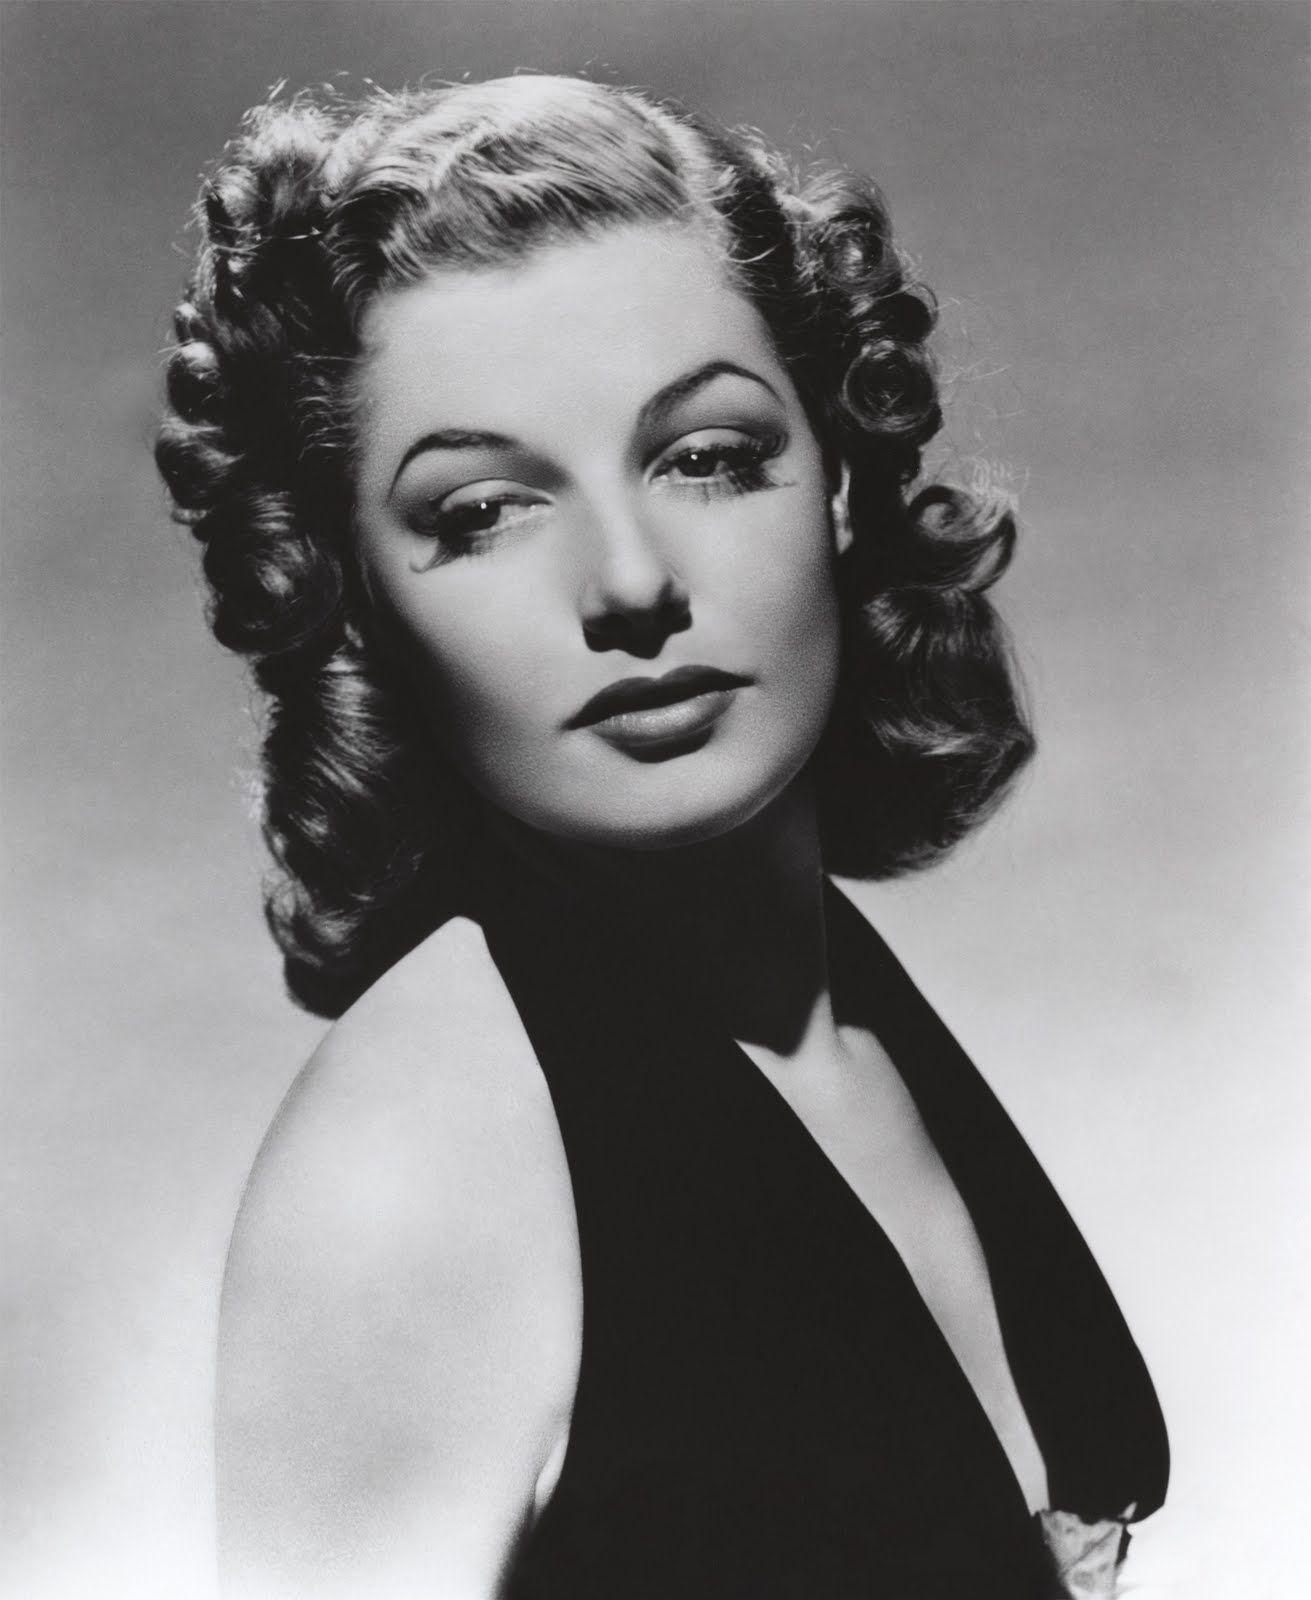 1940s female movie stars - google search   vintage hollywood